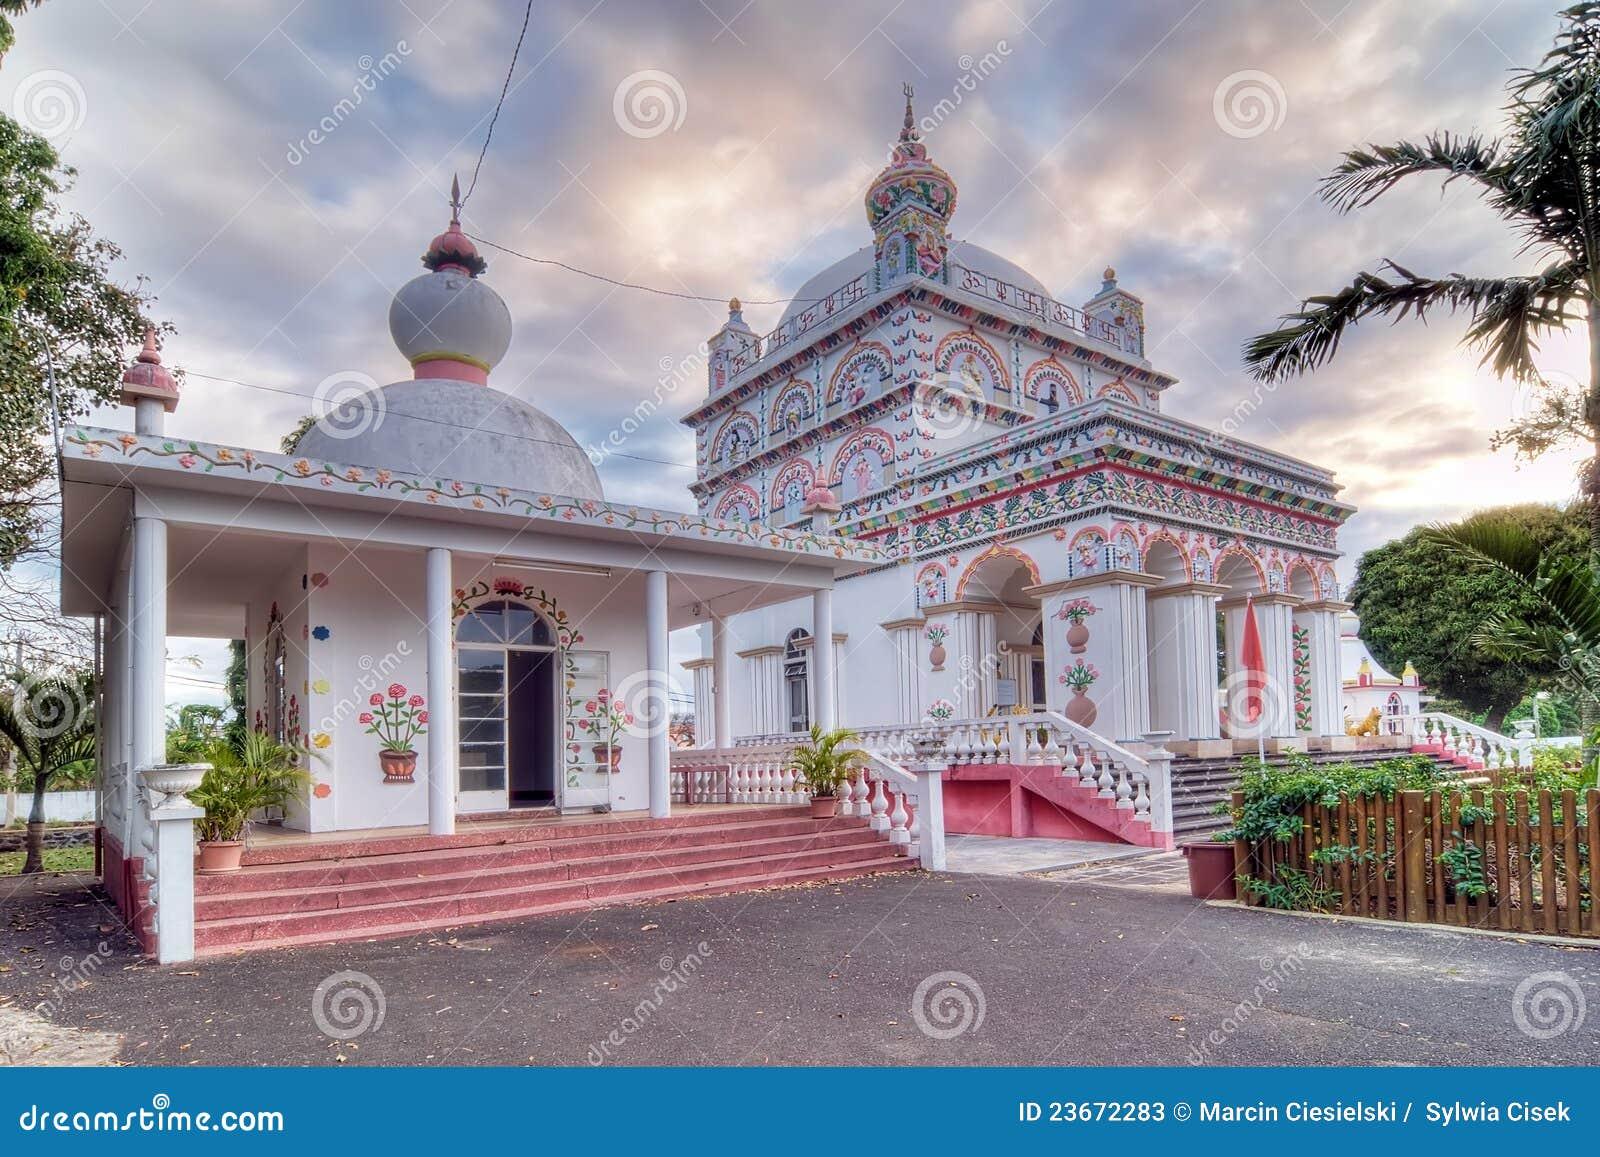 Temple de Maheswarnath en Îles Maurice